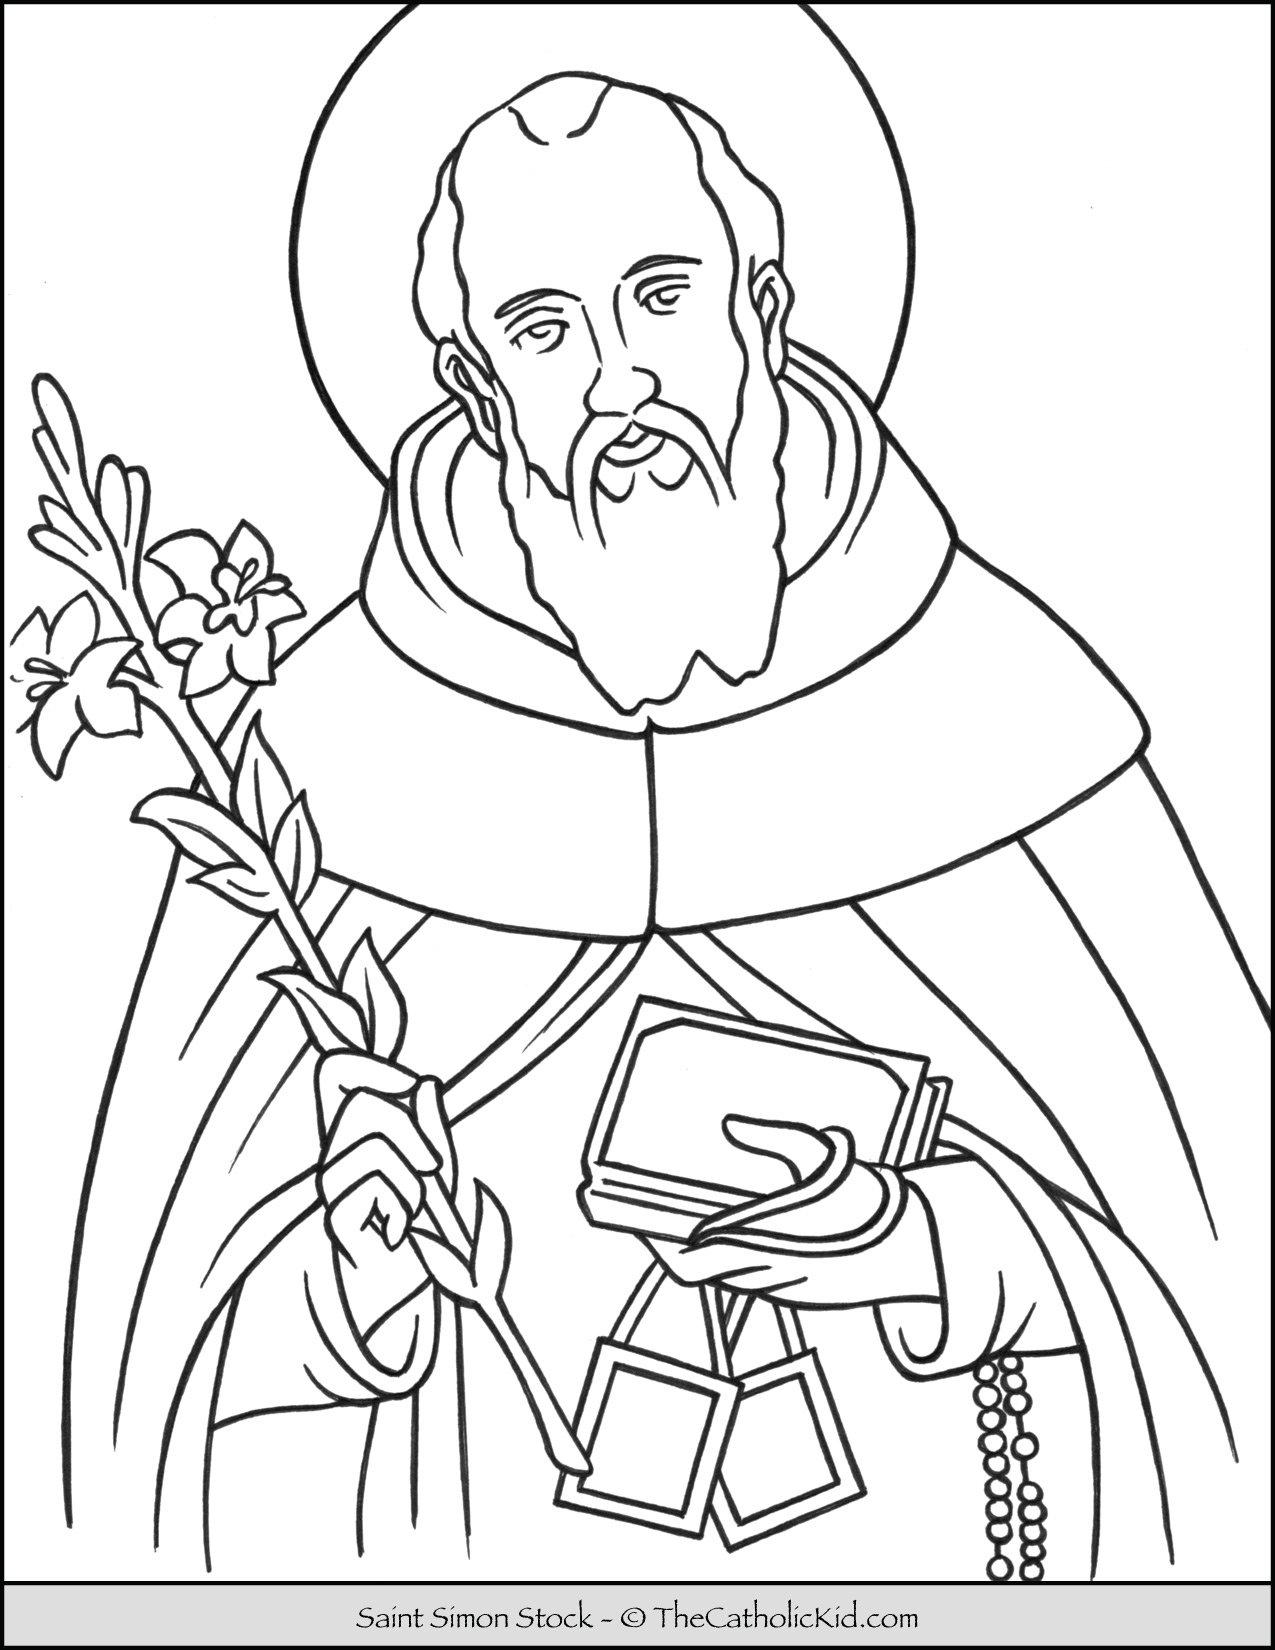 Saint Simon Stock Coloring Page